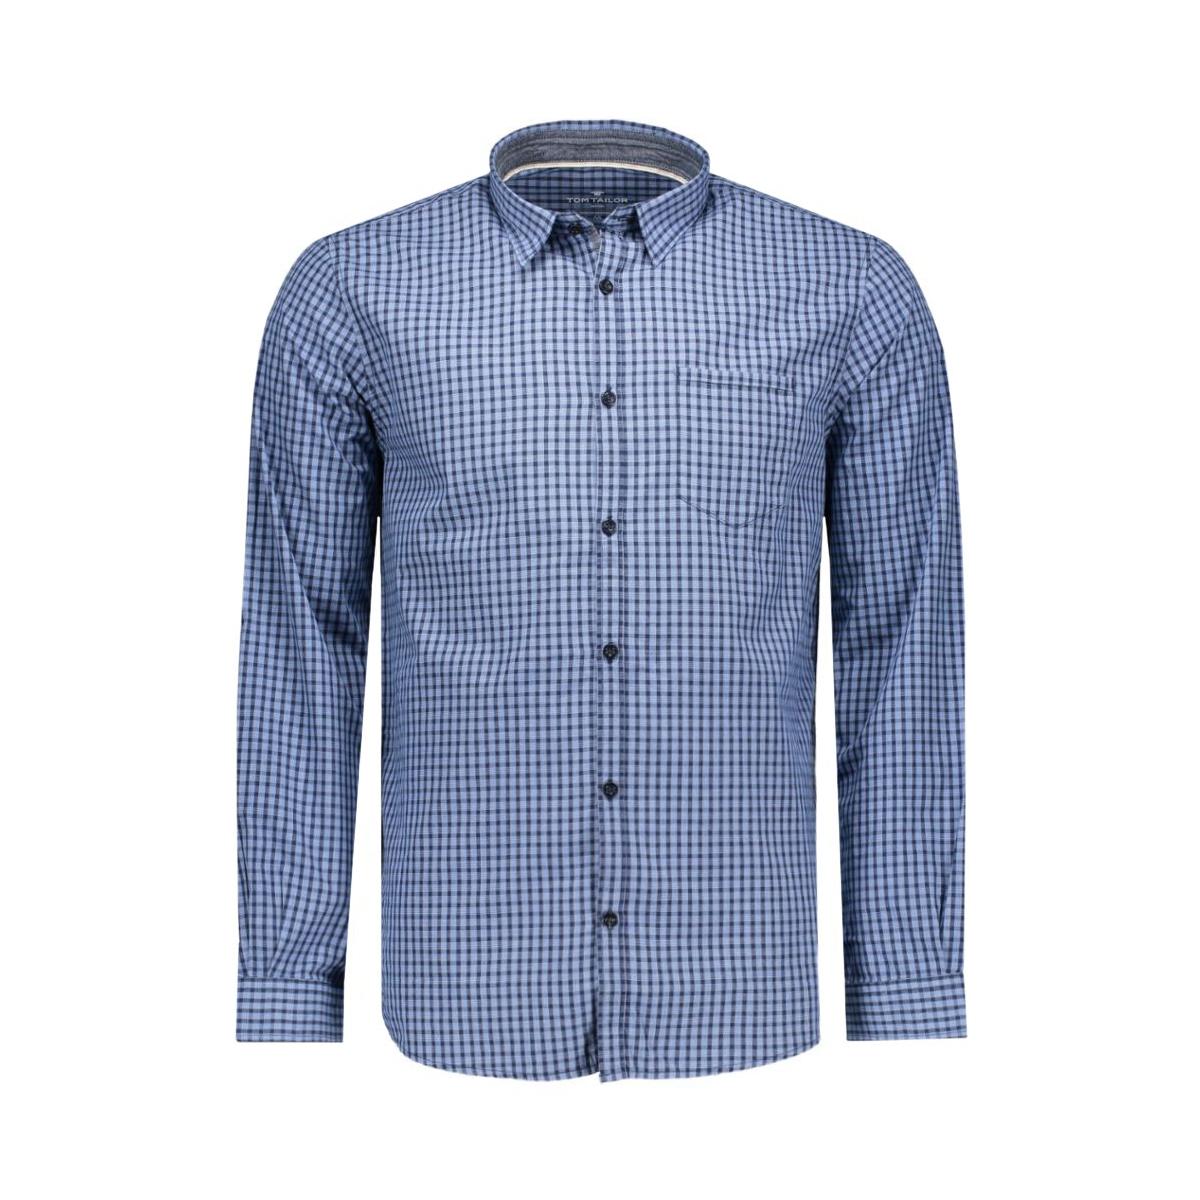 2032101.09.10 tom tailor overhemd 6695